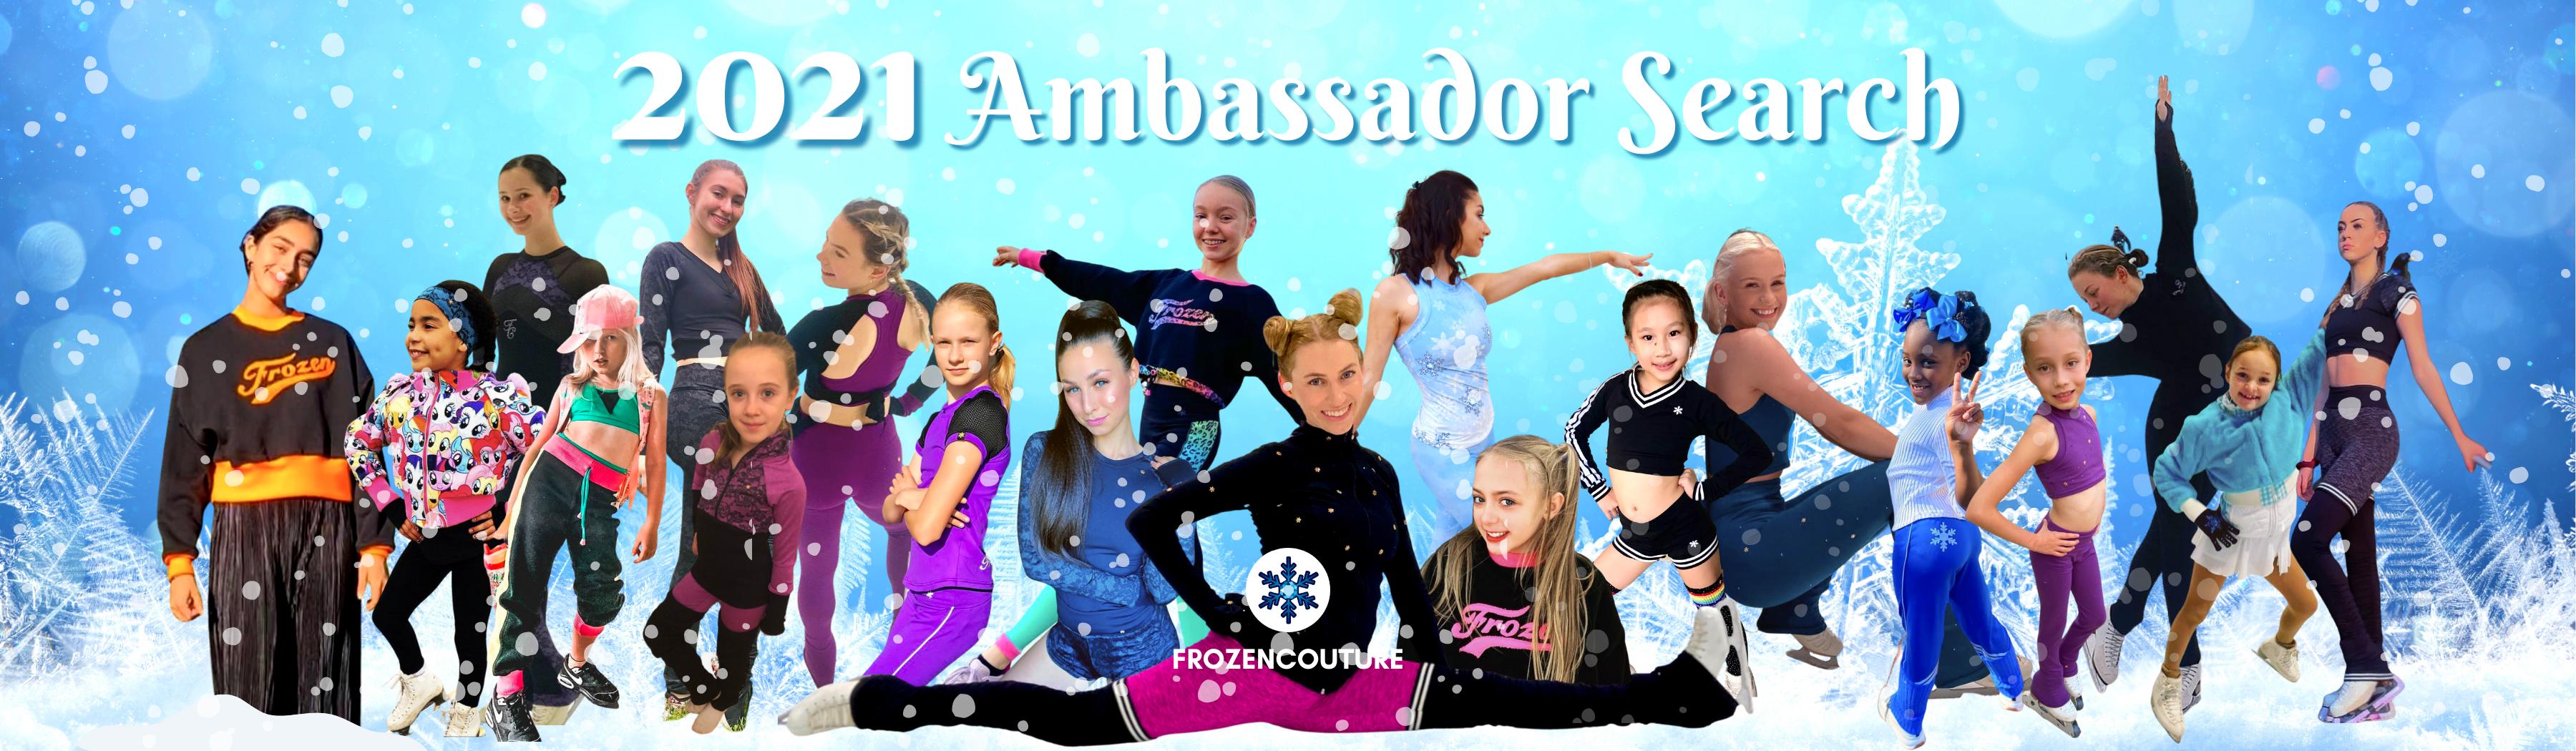 2021-ambassador-search-website1.png